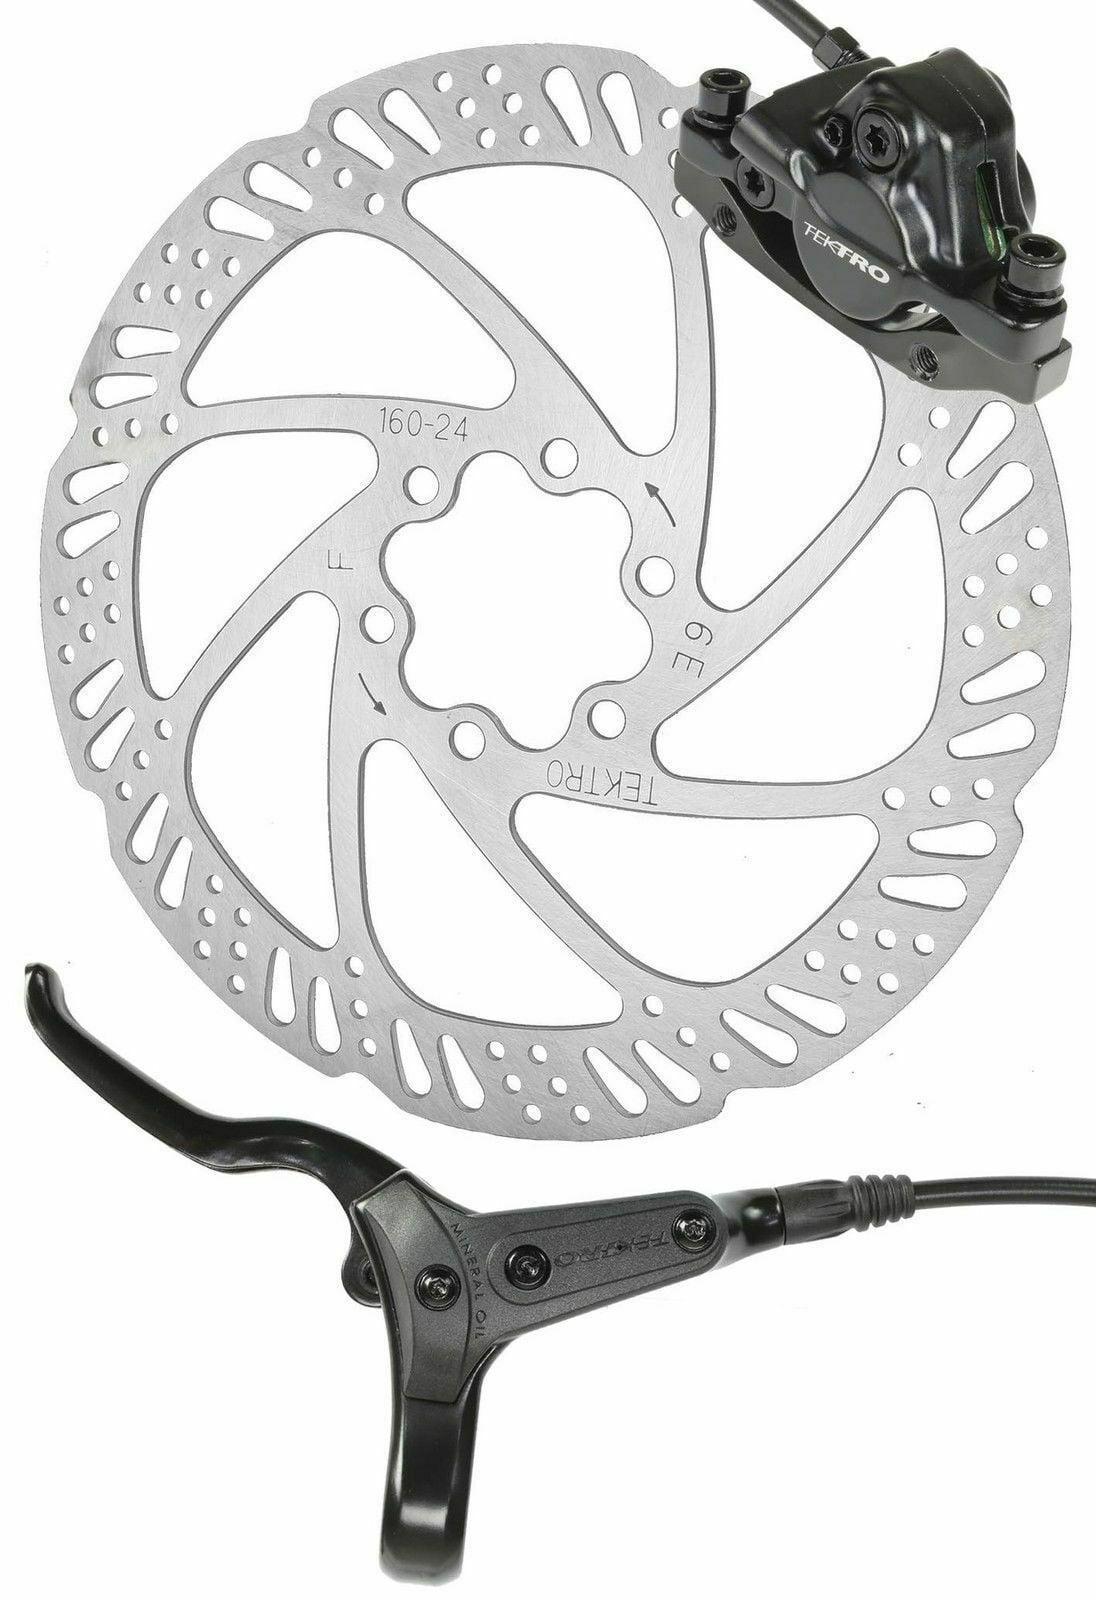 Tektro HD-M285 Hydraulic Disc Front Bike Brake 160mm 6 Bolt Disc w// Rotor /& Pads